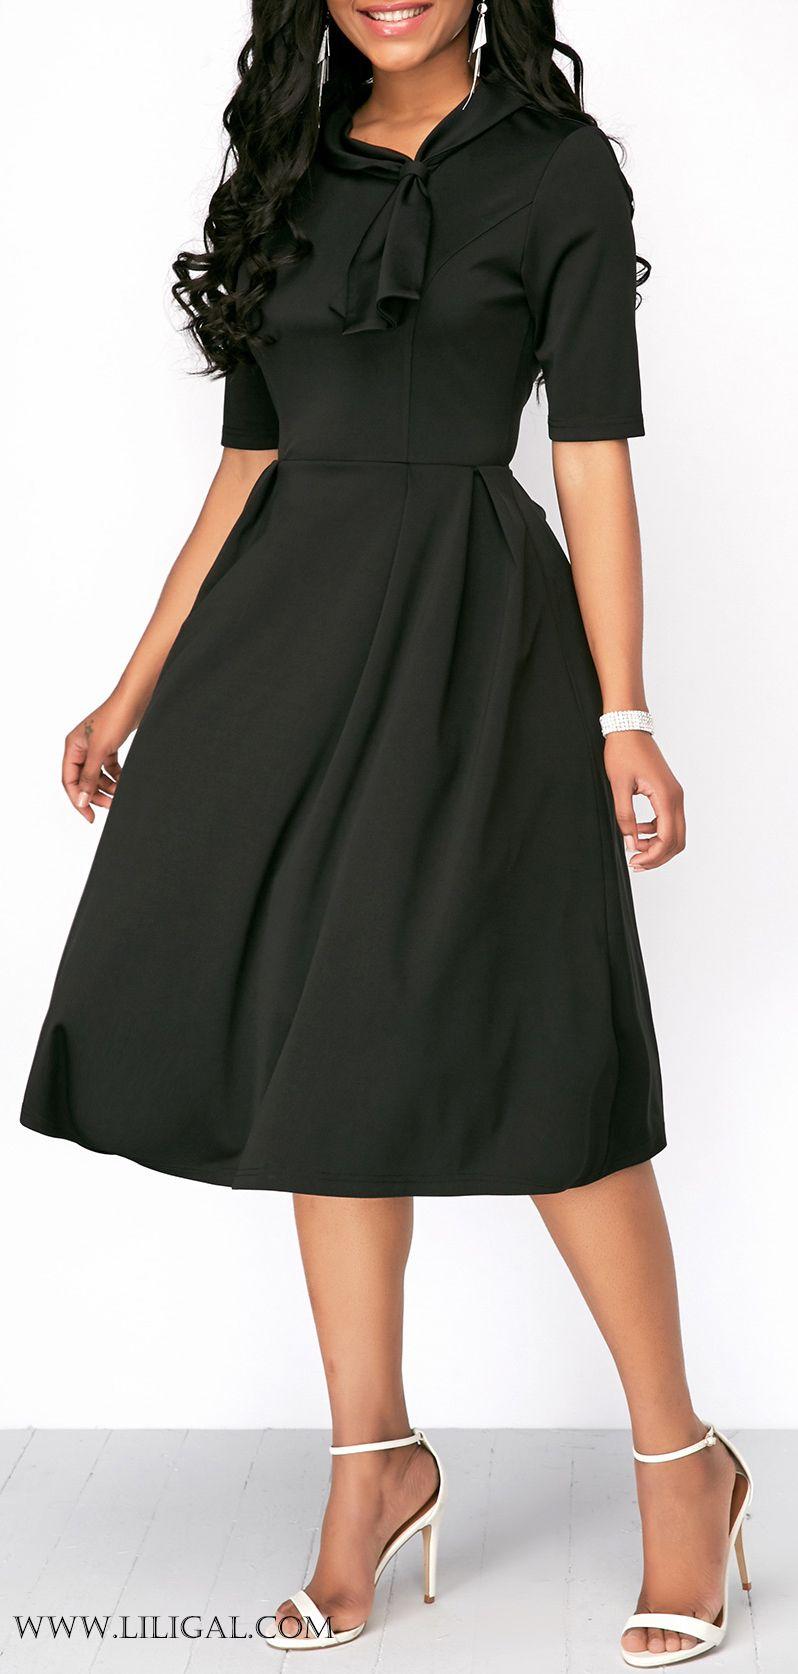 High Waist Half Sleeve Black Dress Vestidos Pinterest Bri Samsung Smartwatch Gear S3 Frontier Sm R760ndaaxar Liligal Dresses Womenswear Womensfashion